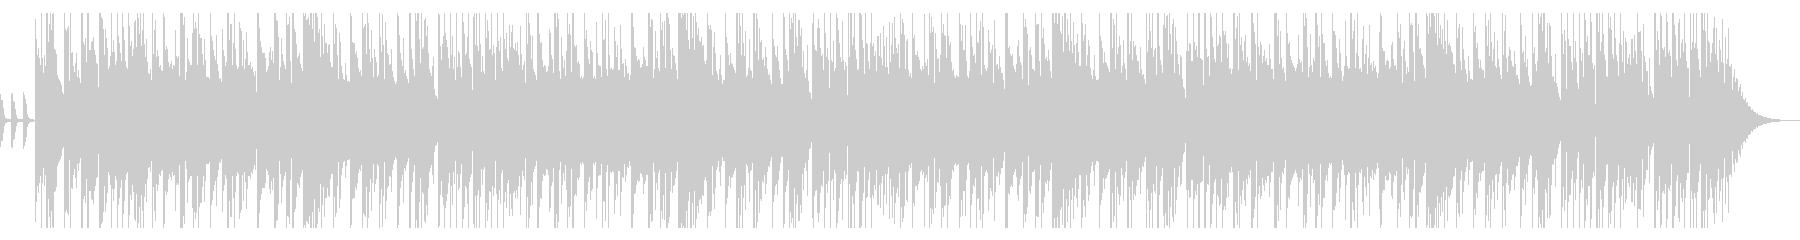 CMや動画にハードロックなベース&ドラムの未再生の波形